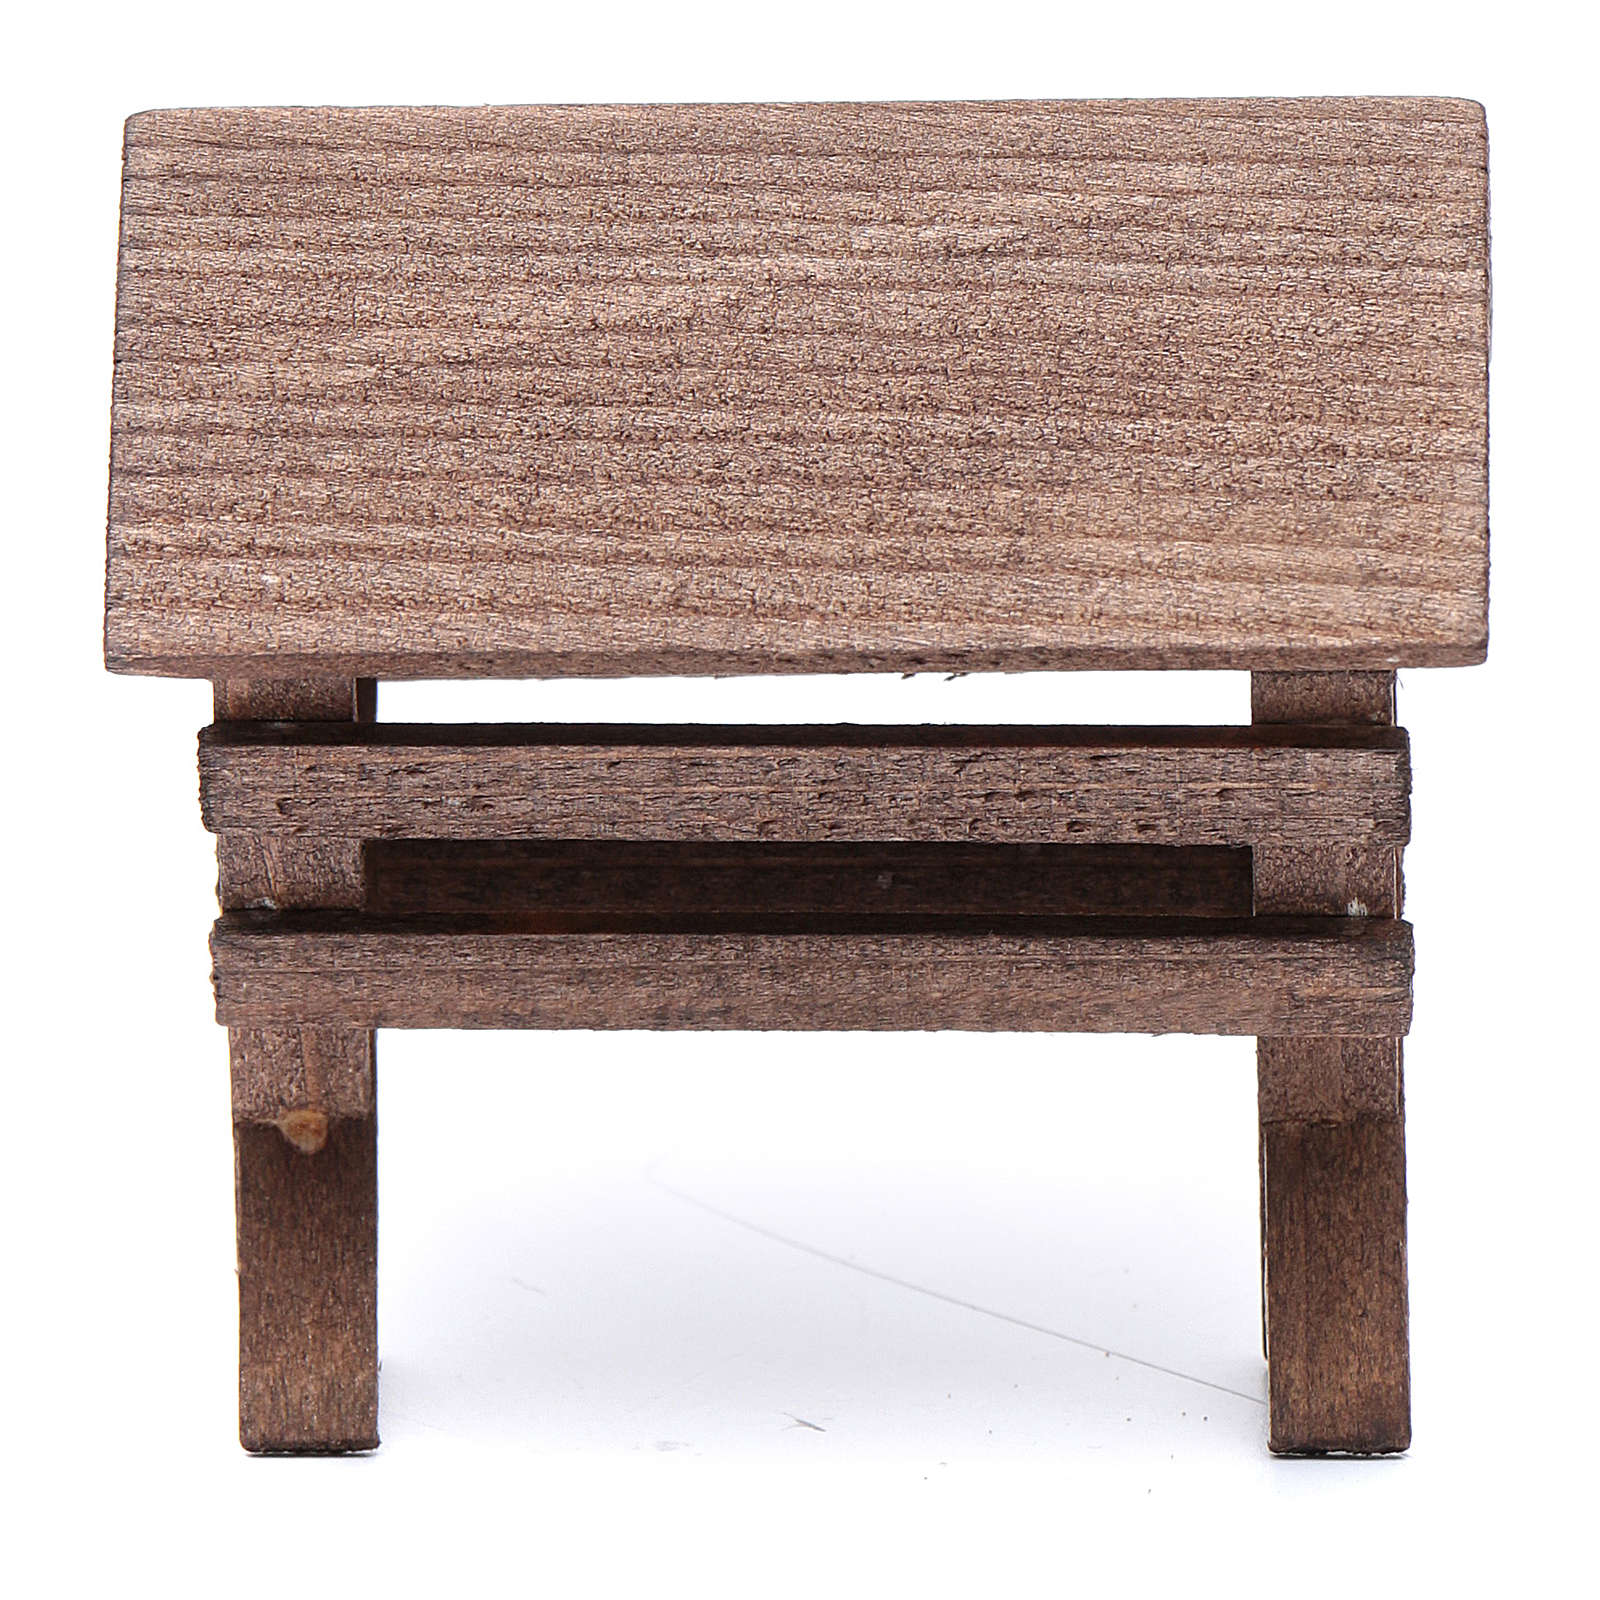 Mangiatoia per animali legno presepe 8x6,5x8 cm 4